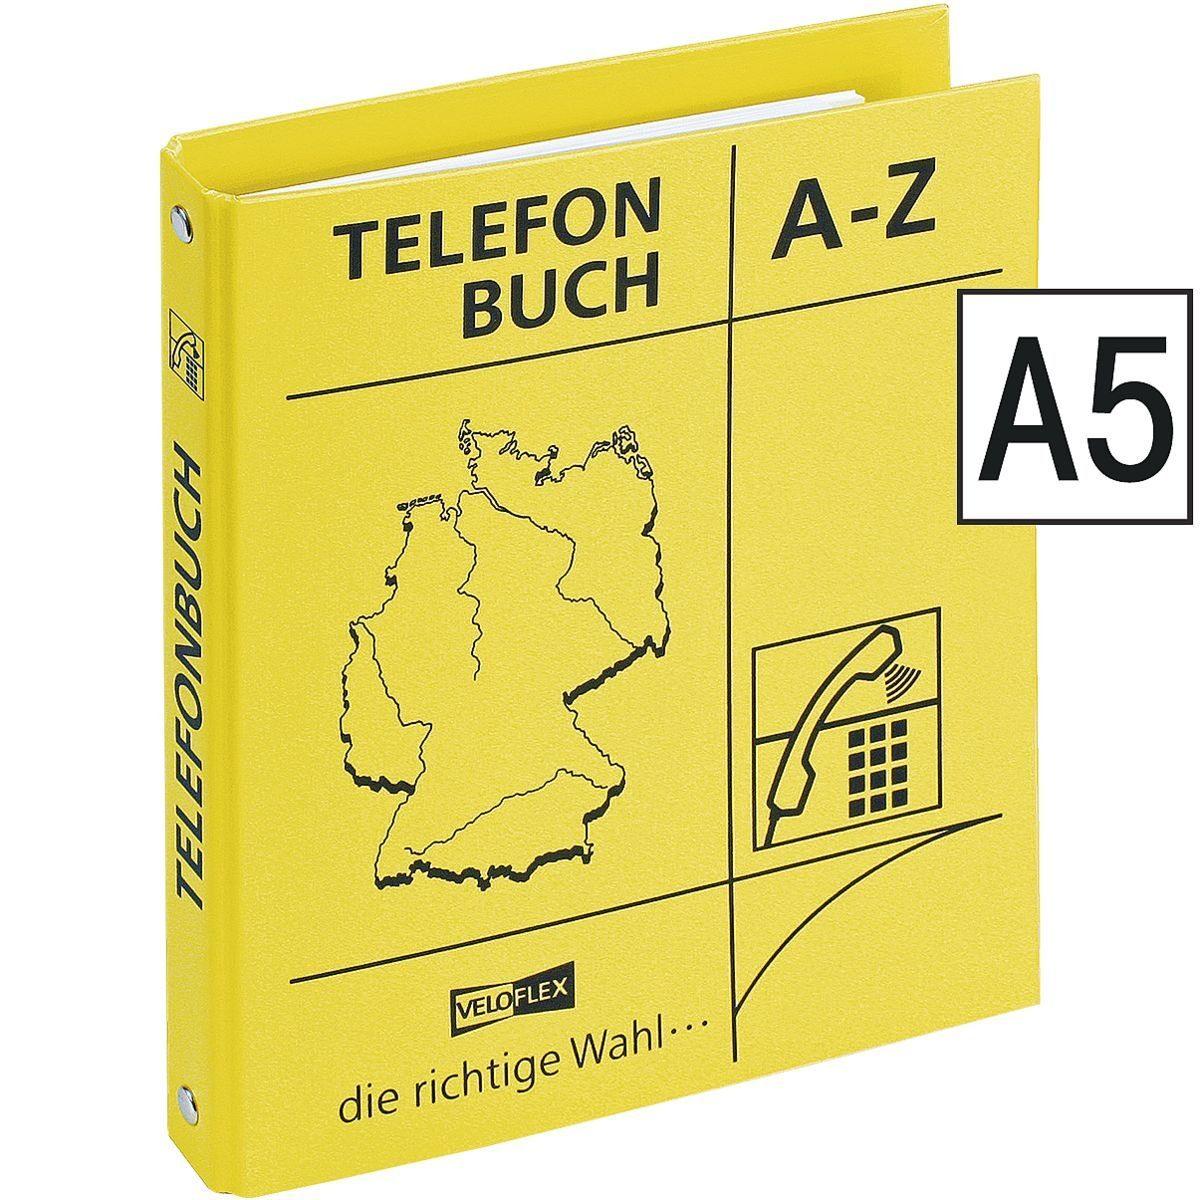 Veloflex Telefonringbuch